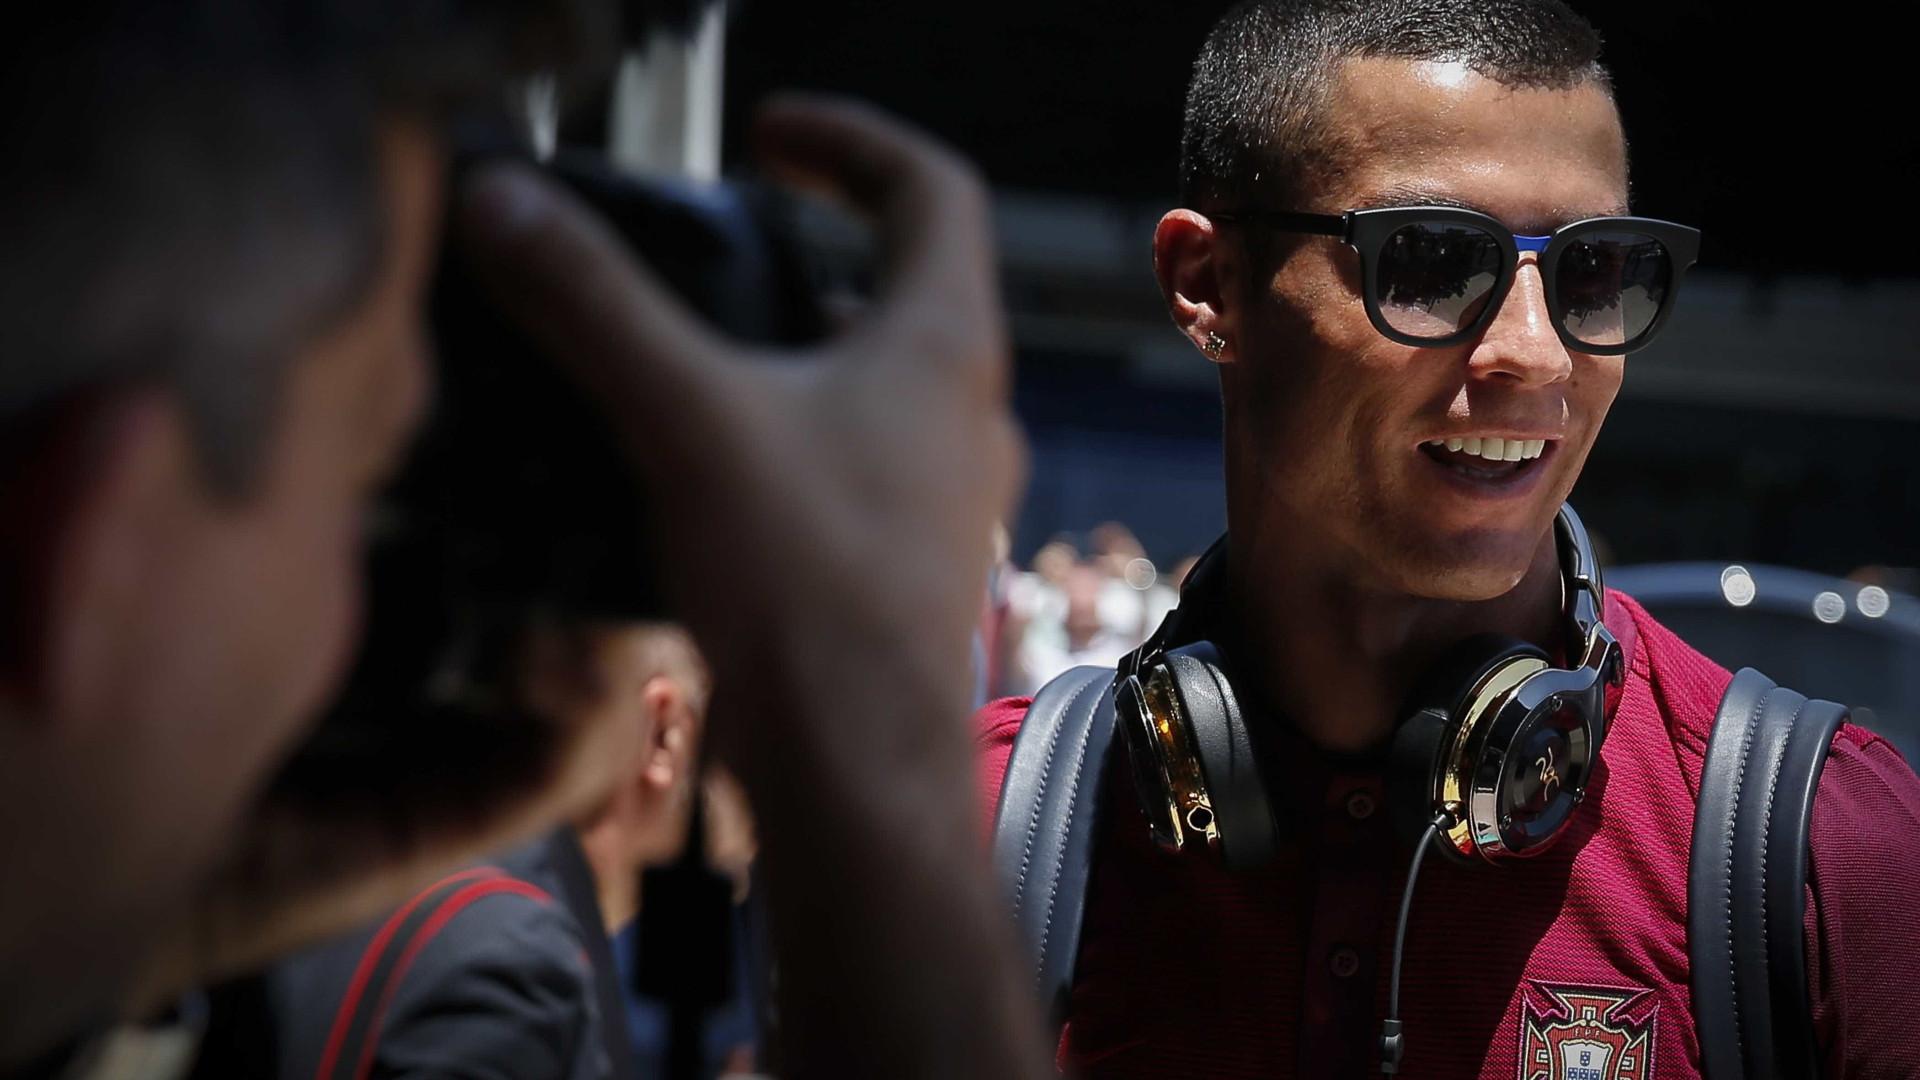 """Se Cristiano Ronaldo acabar na prisão, tornar-se-á na 'Miss Setembro'"""